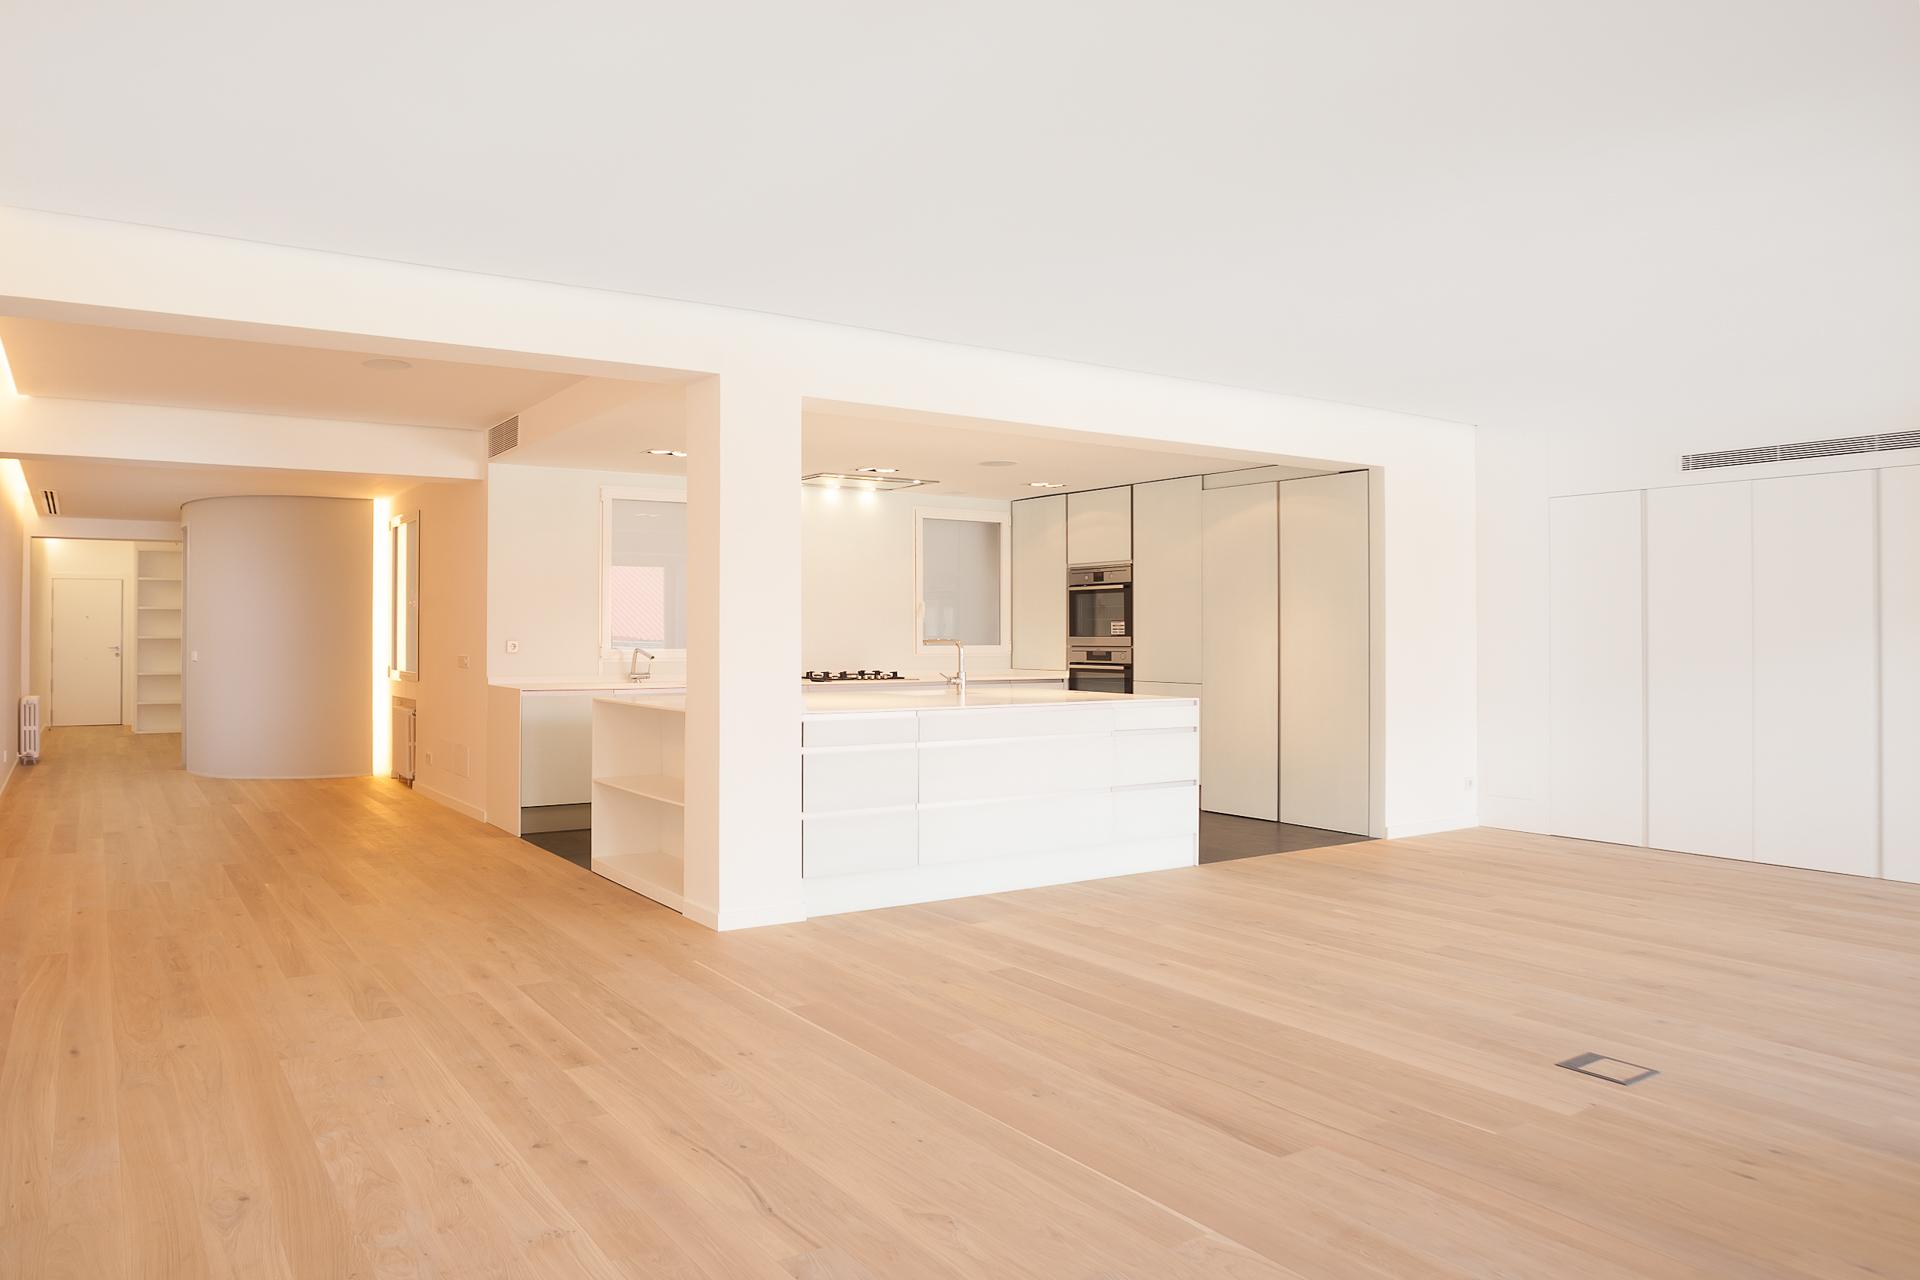 LAGASCA_Maroto_Ibañez_arquitectos04